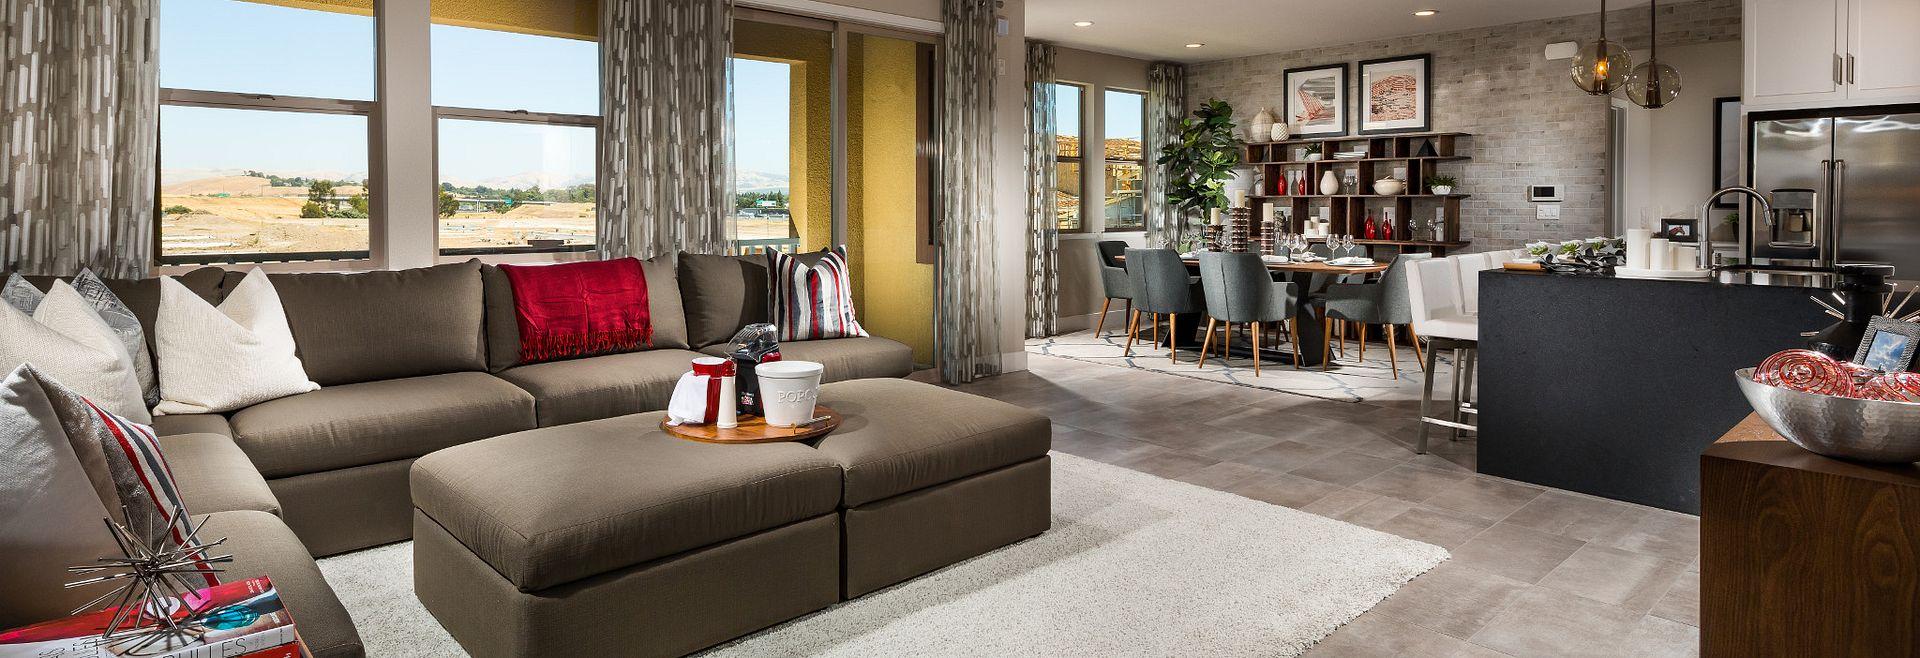 Harmony Plan 7 Sage Livermore Living Room